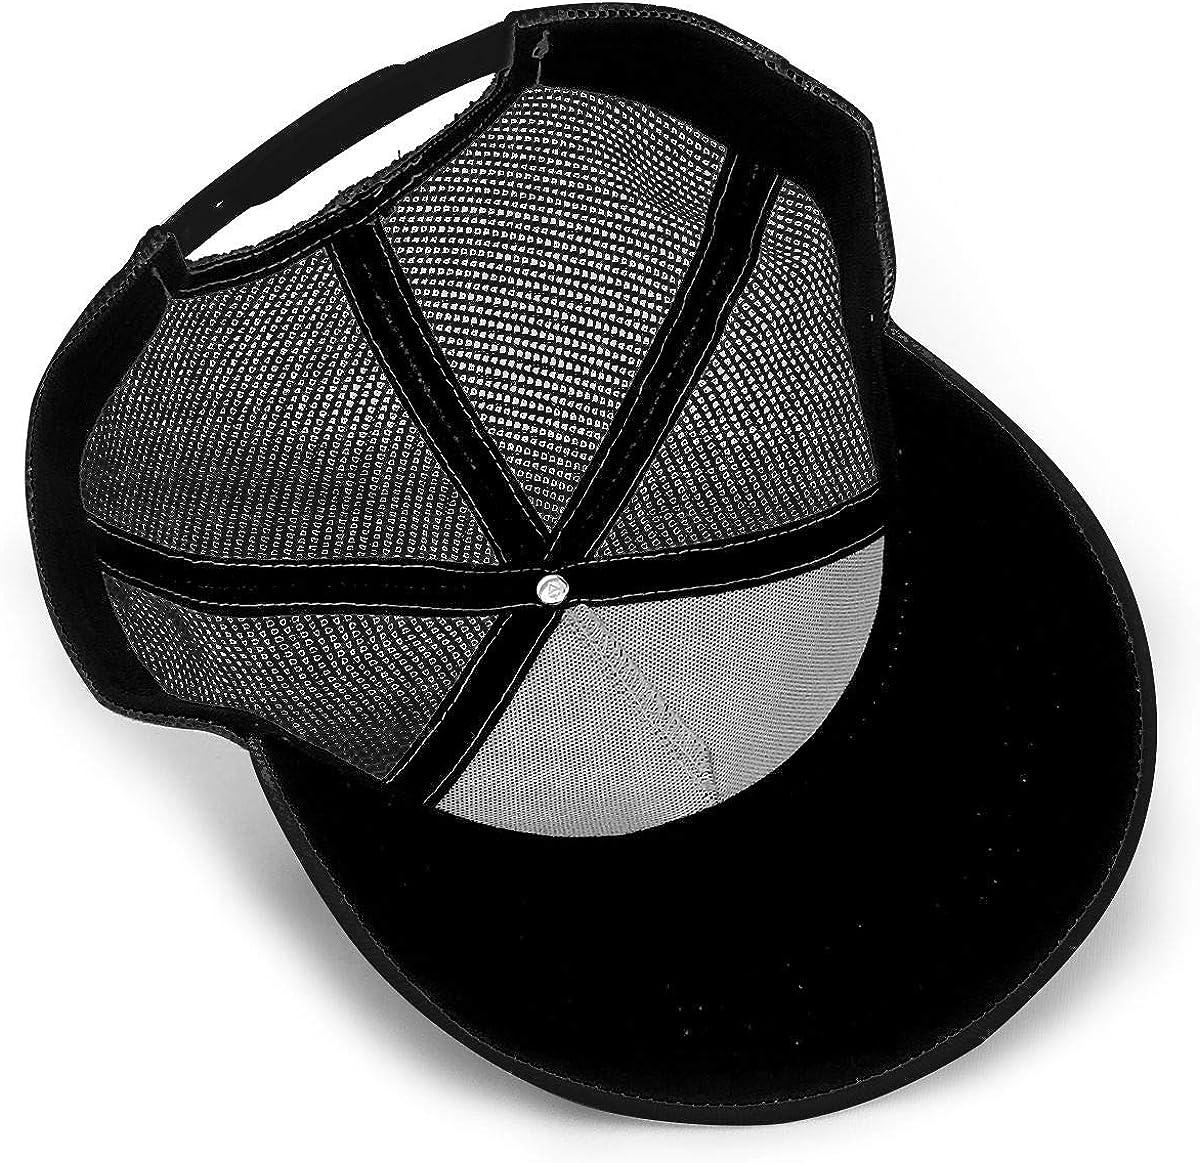 Unisex Basketball-Ky-RIE-Ir-ving-G Trucker Cap Adjustable Baseball Hat